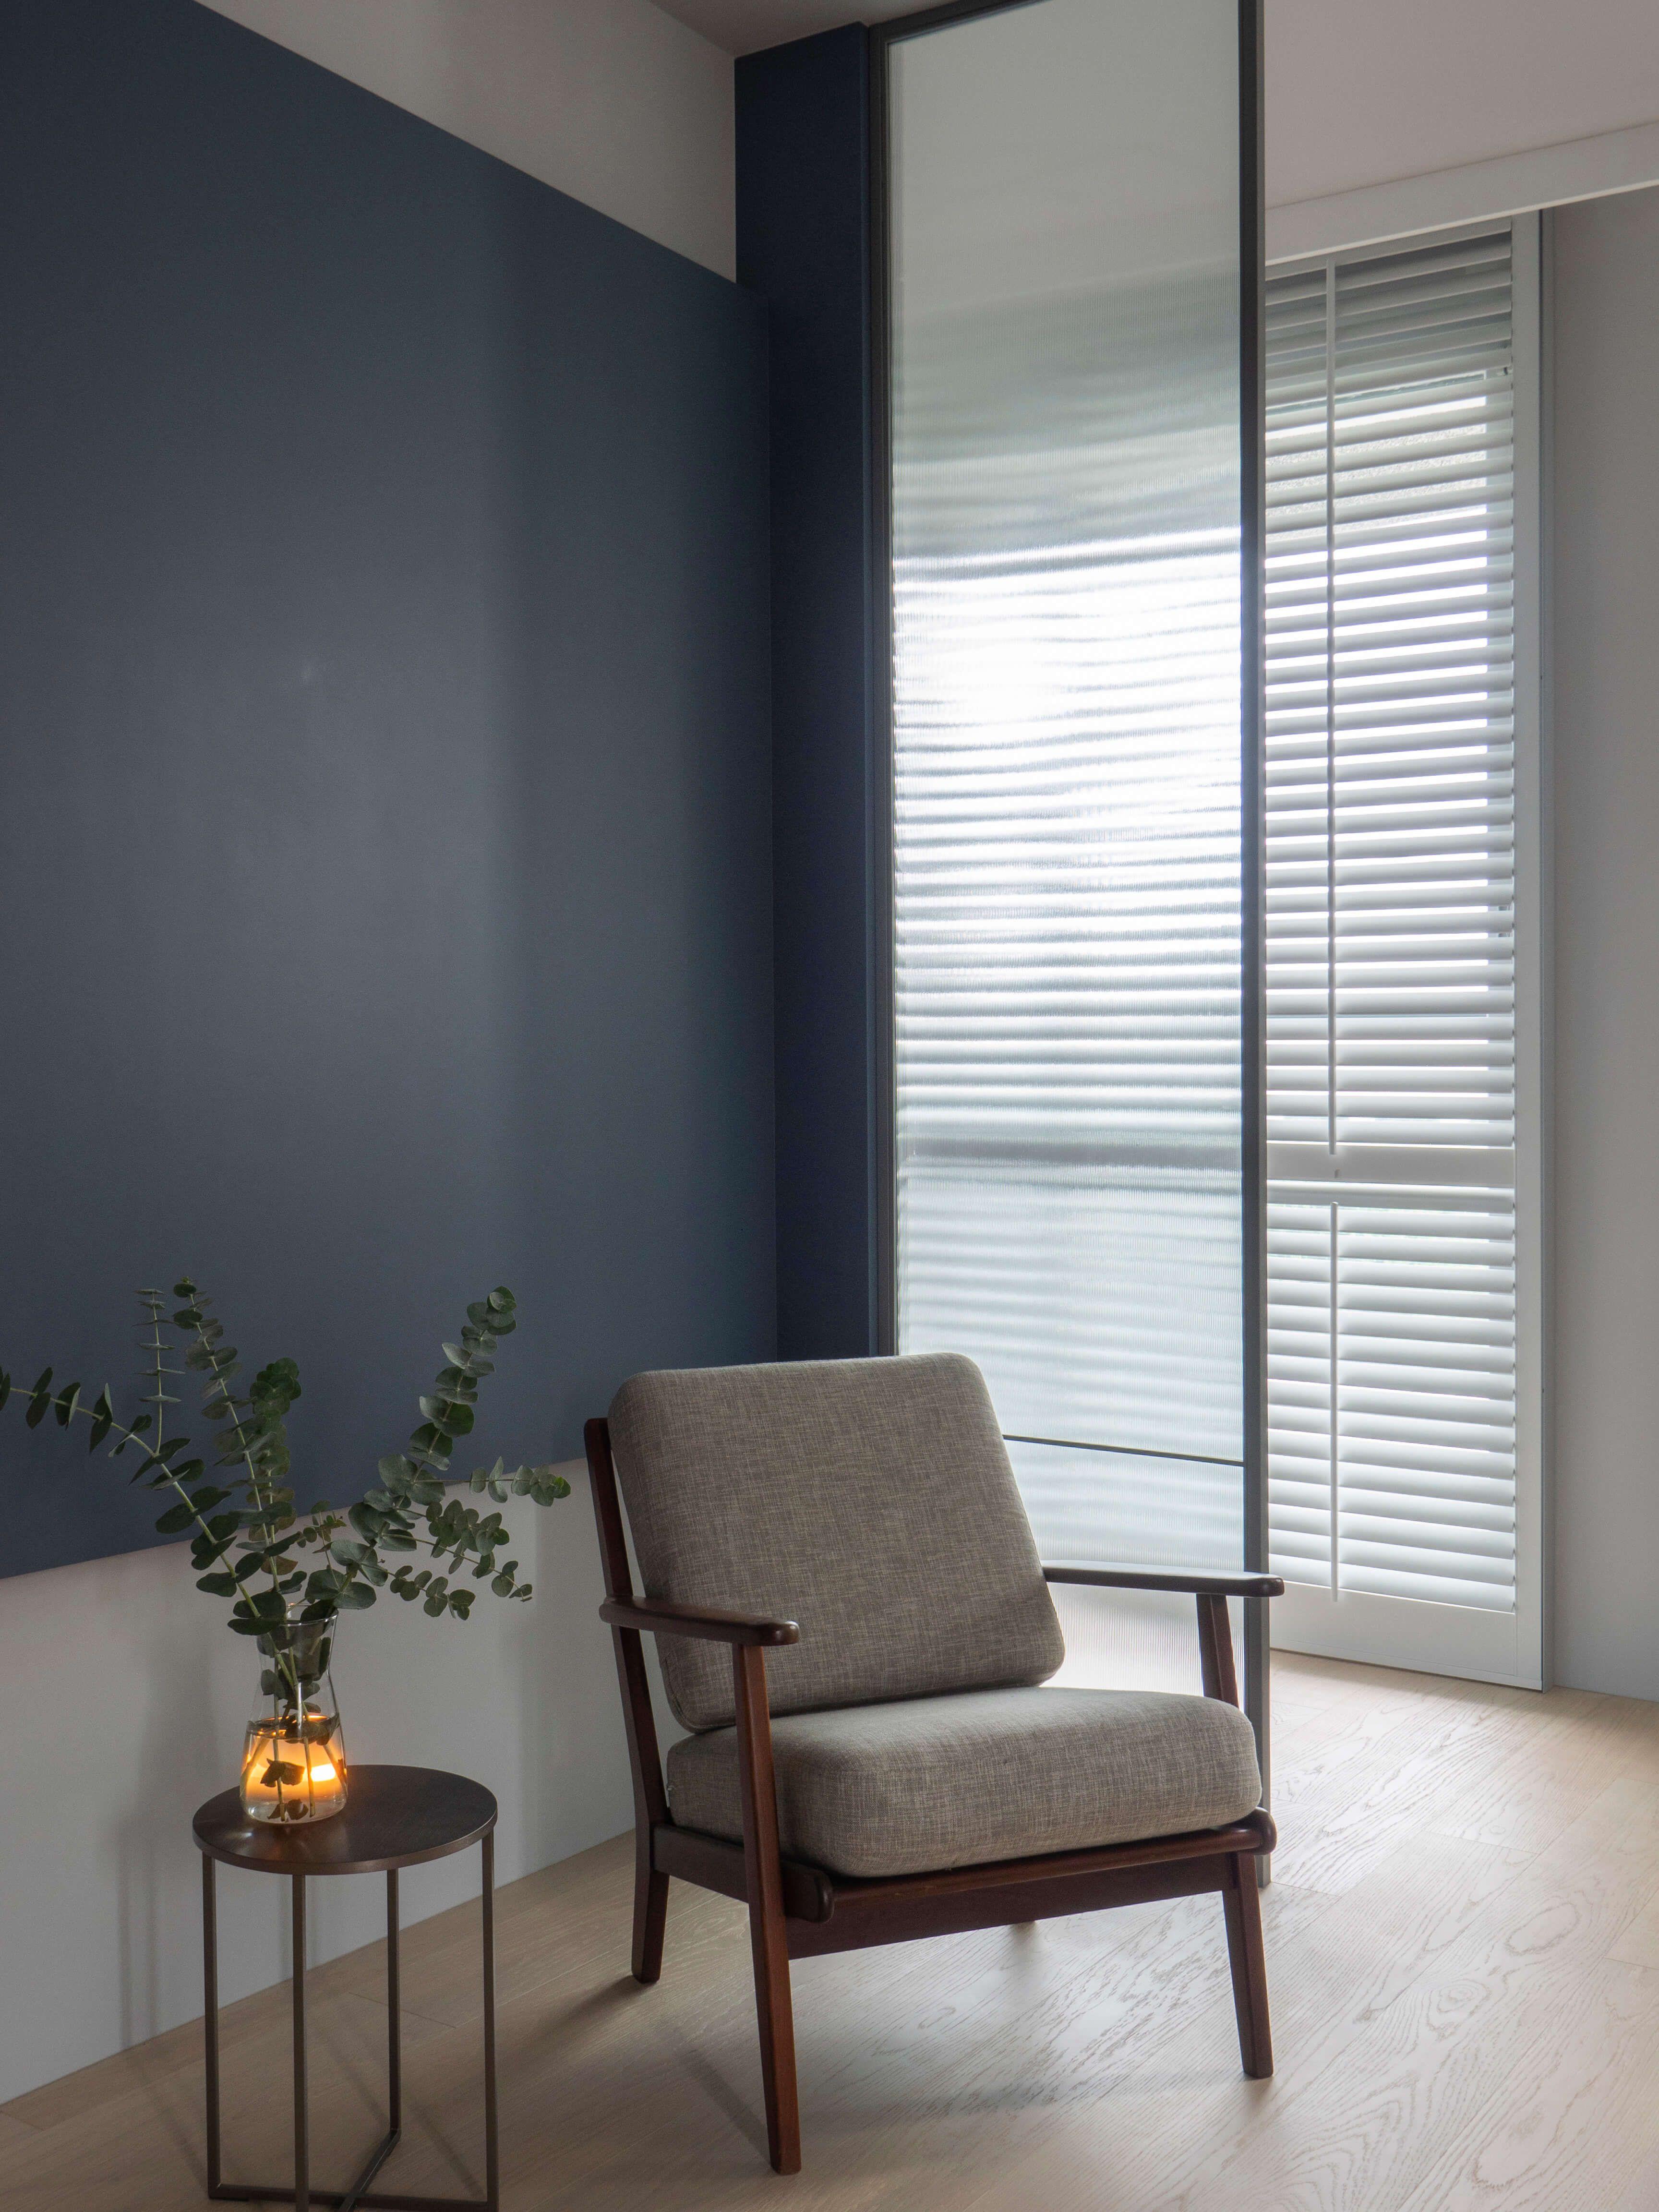 分子室內裝修設計 - 透天住宅 Converge | Furniture, Home decor, Home